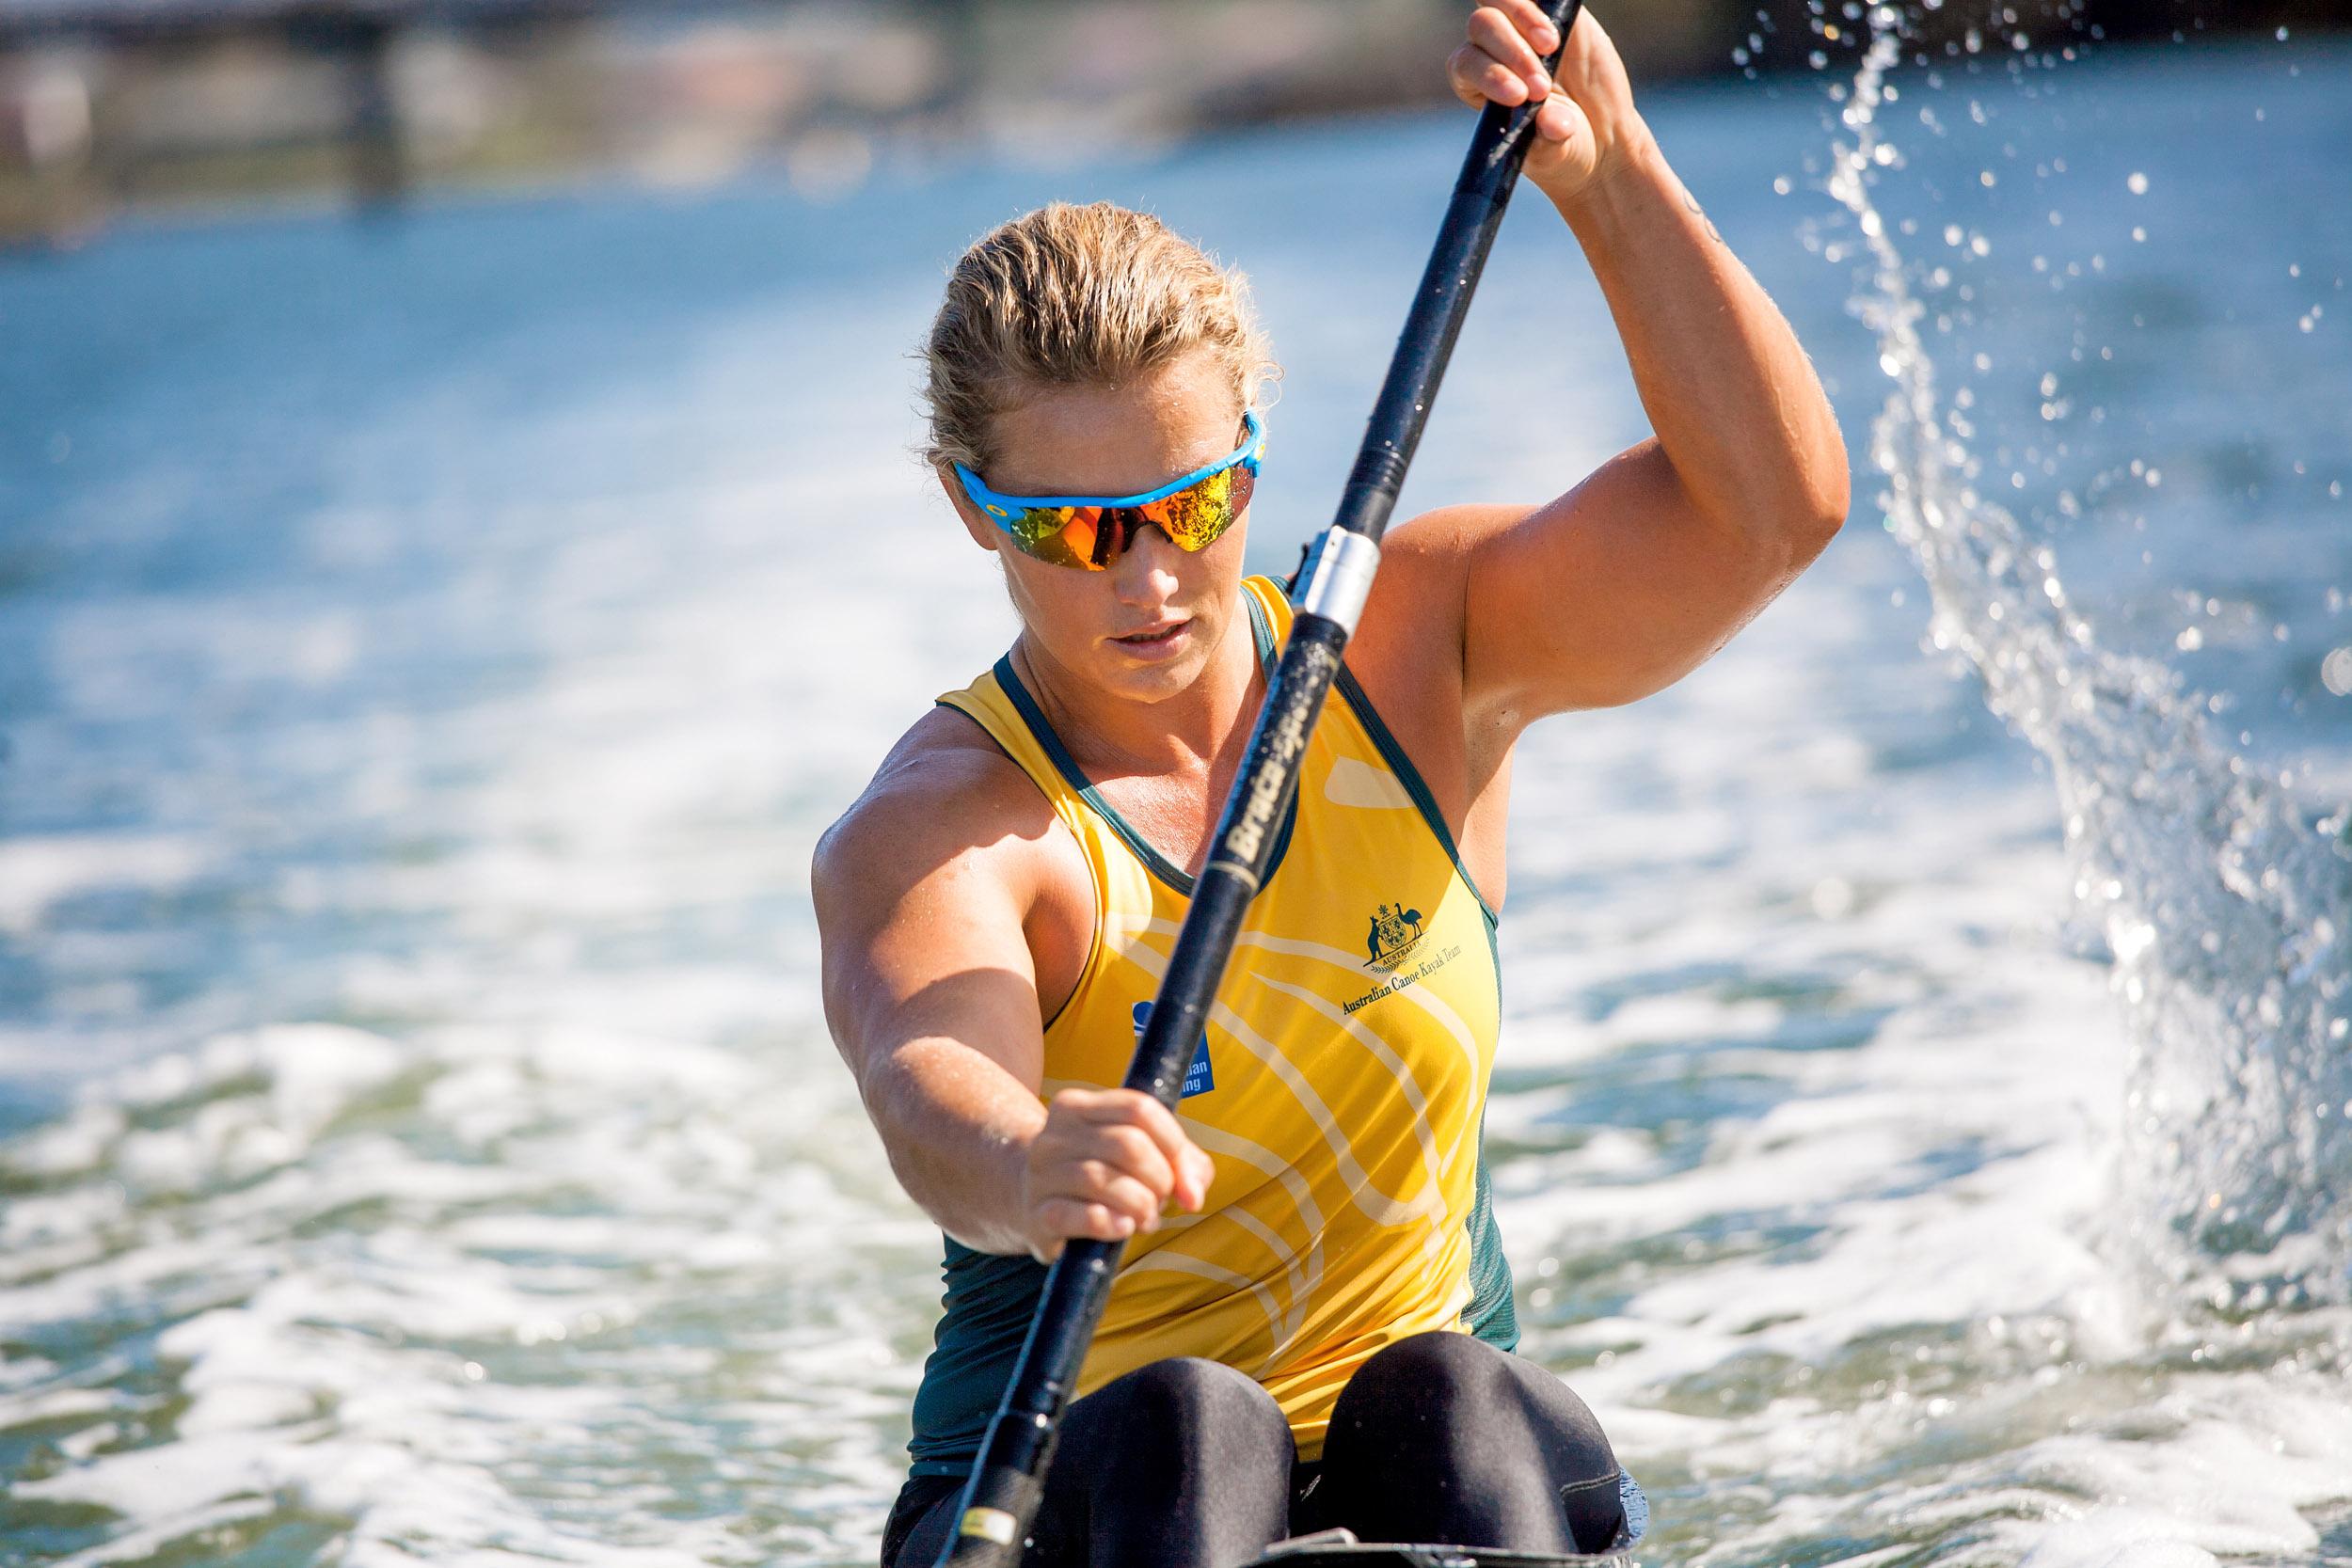 olympian-sport-photography.jpg